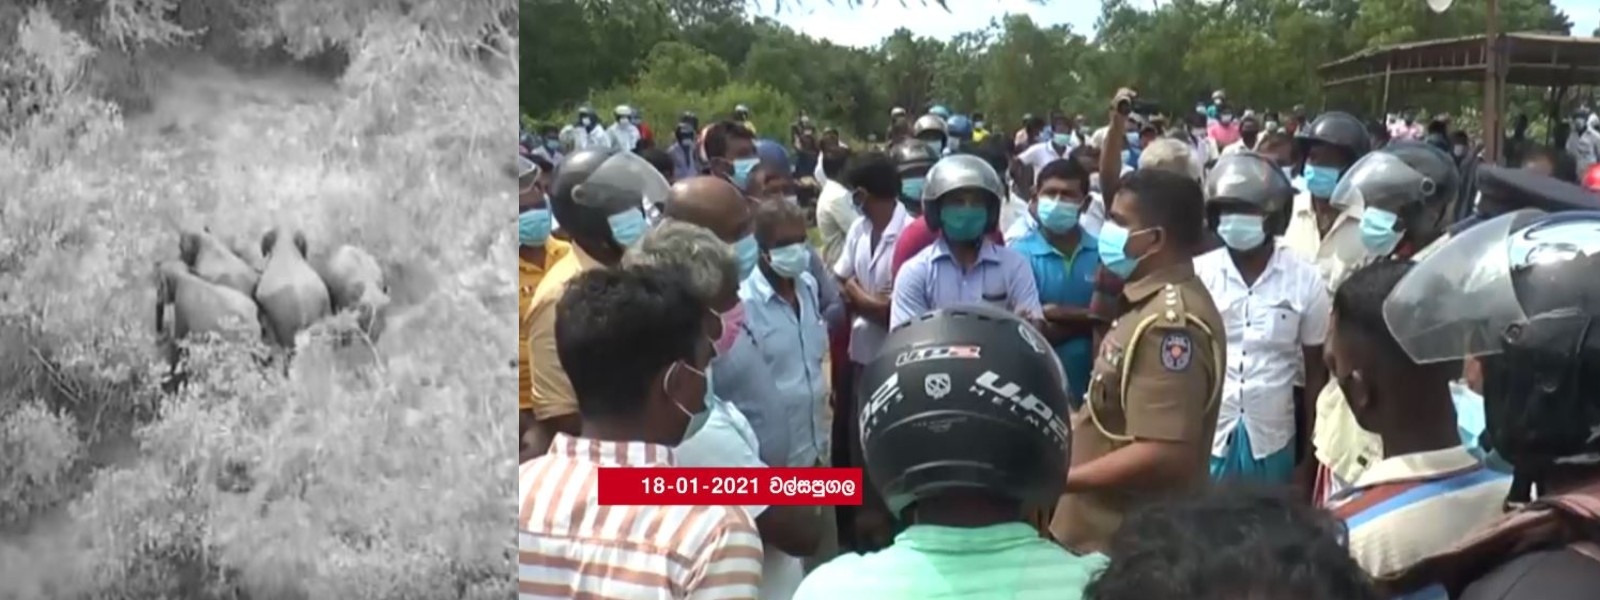 WALSAPUGALA PROTEST DEMANDS ELEPHANT RESERVE GAZETTE